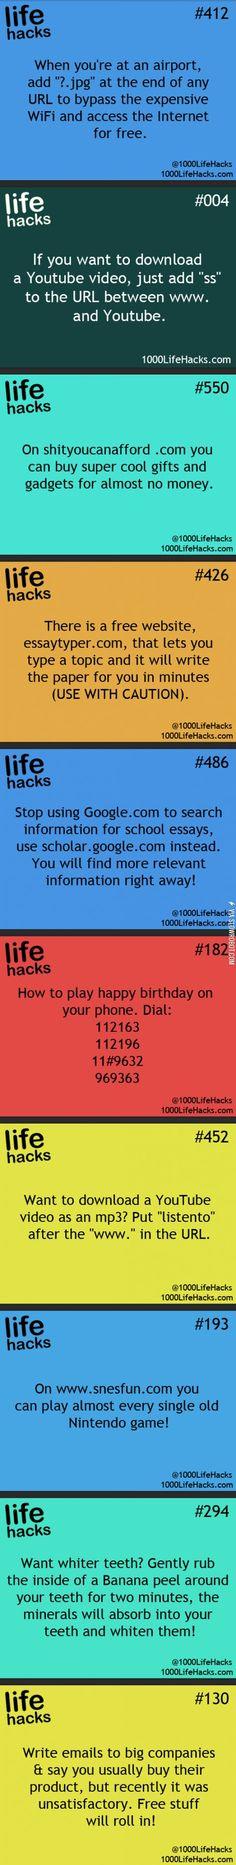 Some worthy life hacks